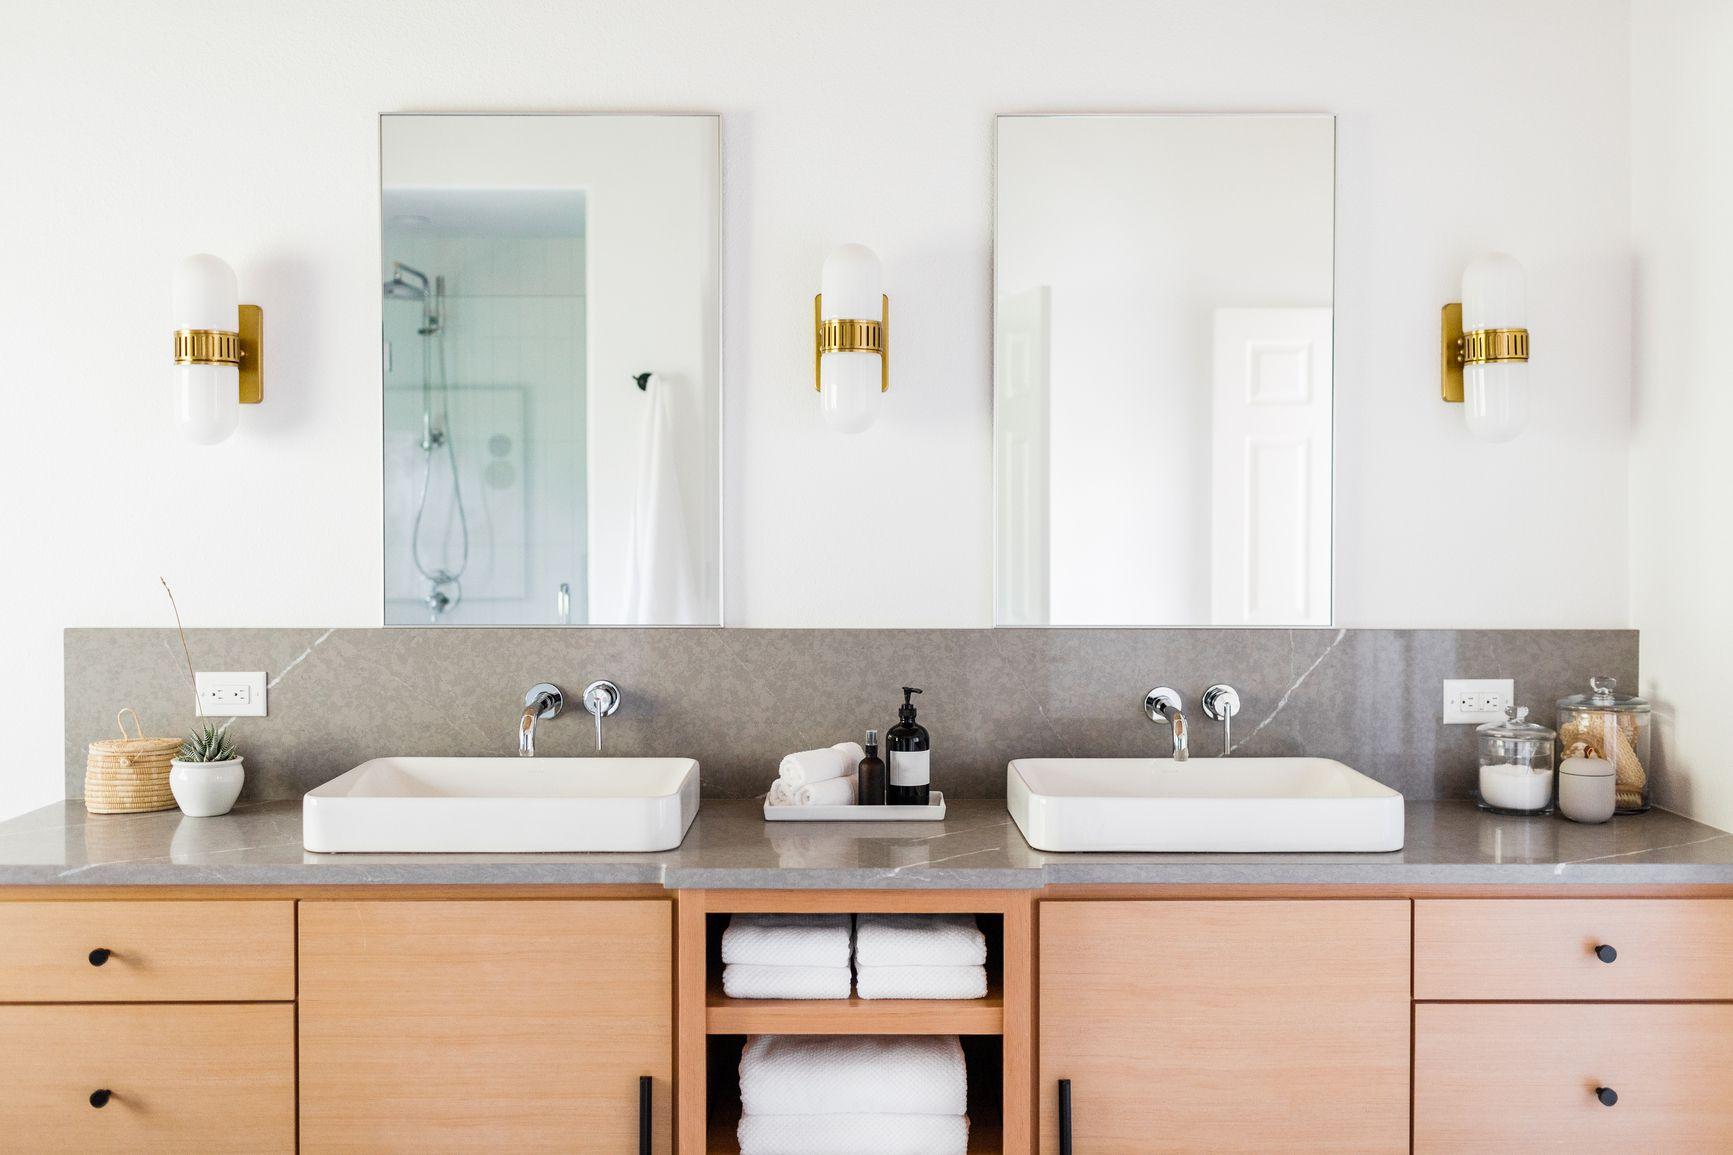 15 Bathroom Remodel Ideas